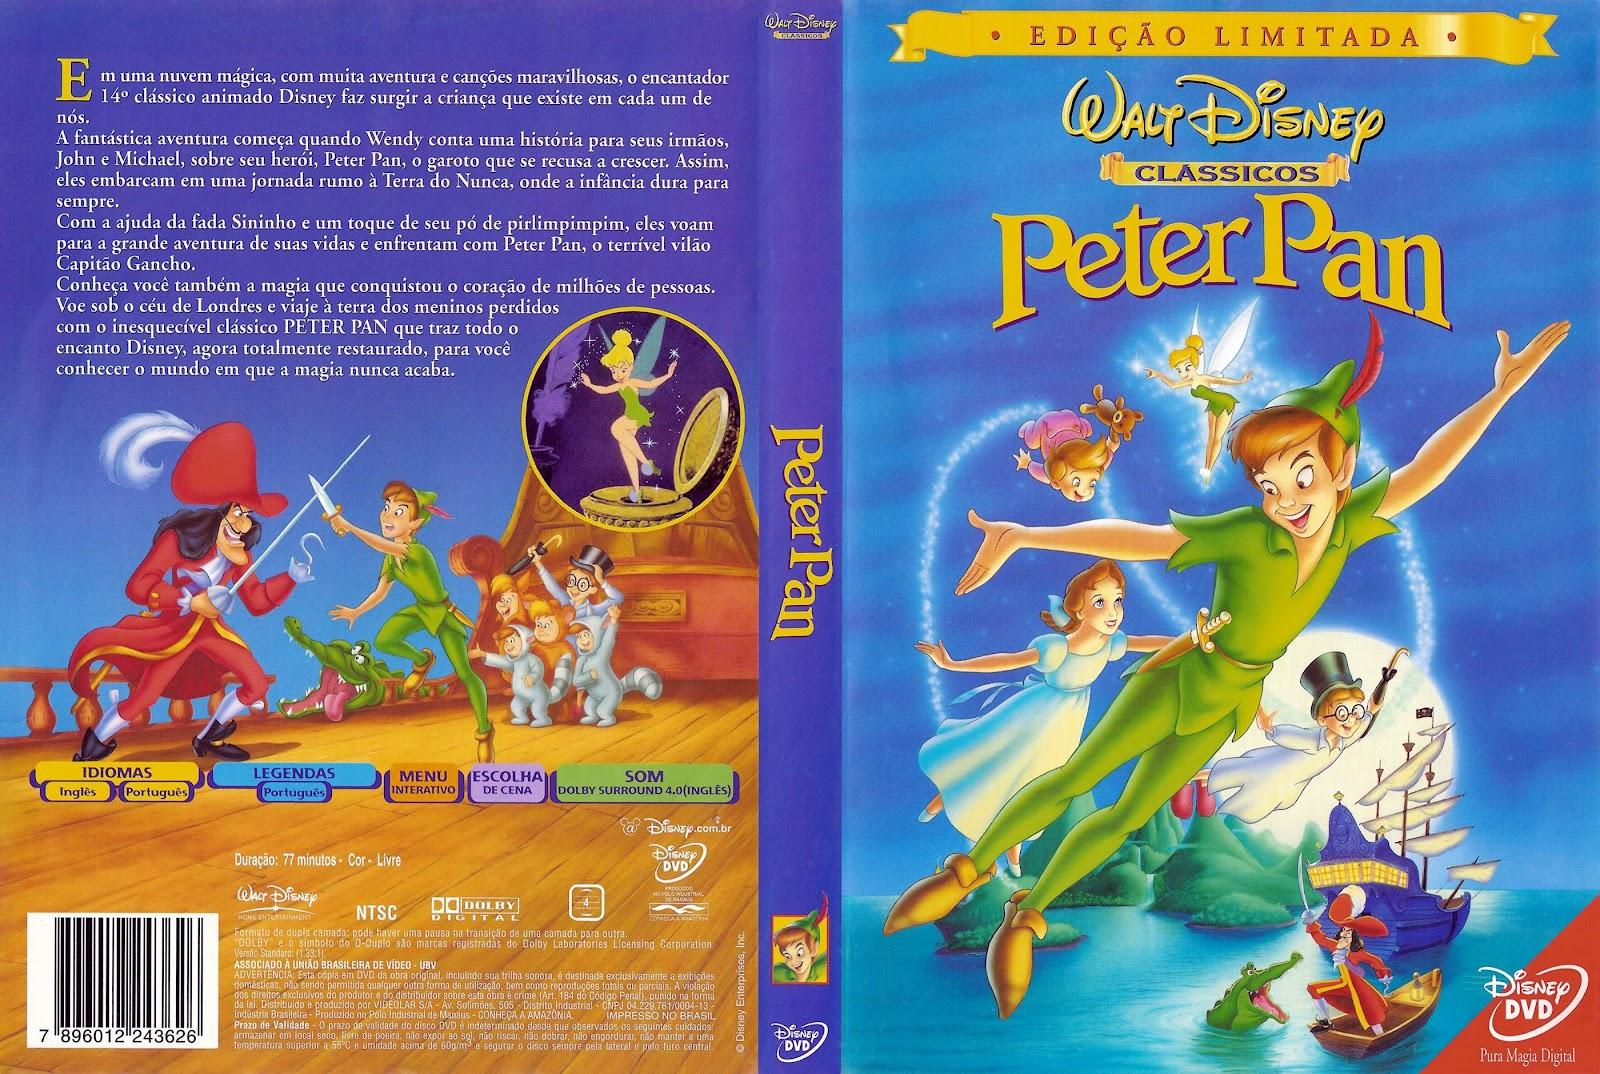 Disney Filme Niederlande Gesproken Download Musik